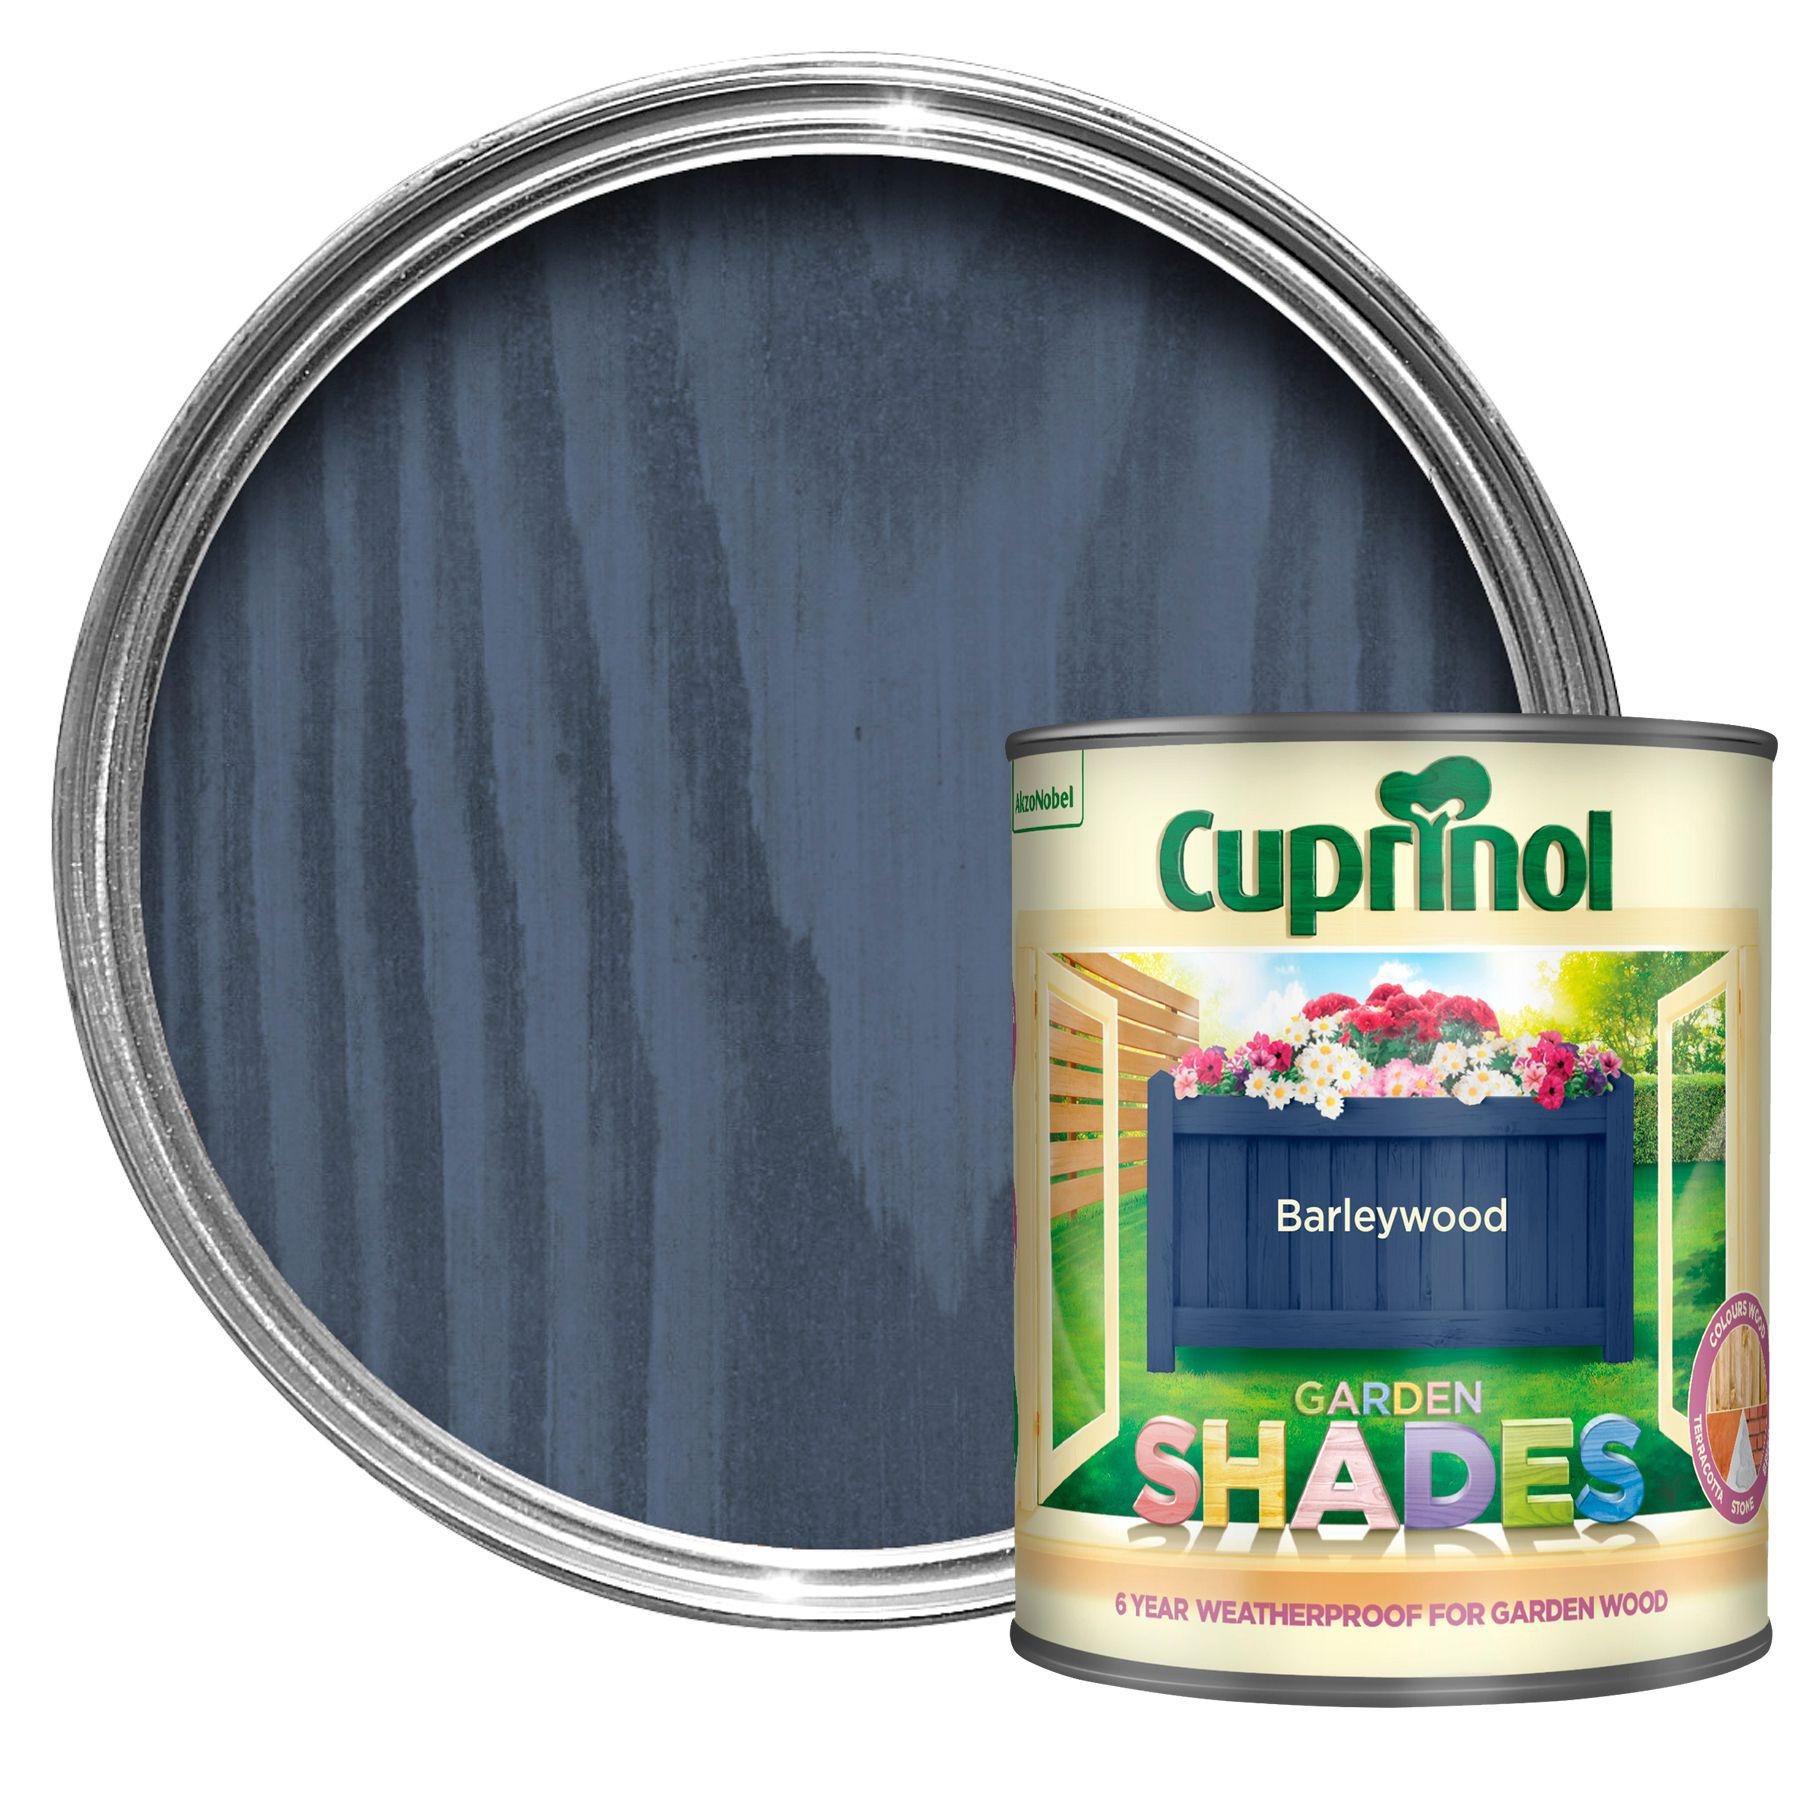 Cuprinol Garden Shades Barleywood Matt Wood Paint 1l